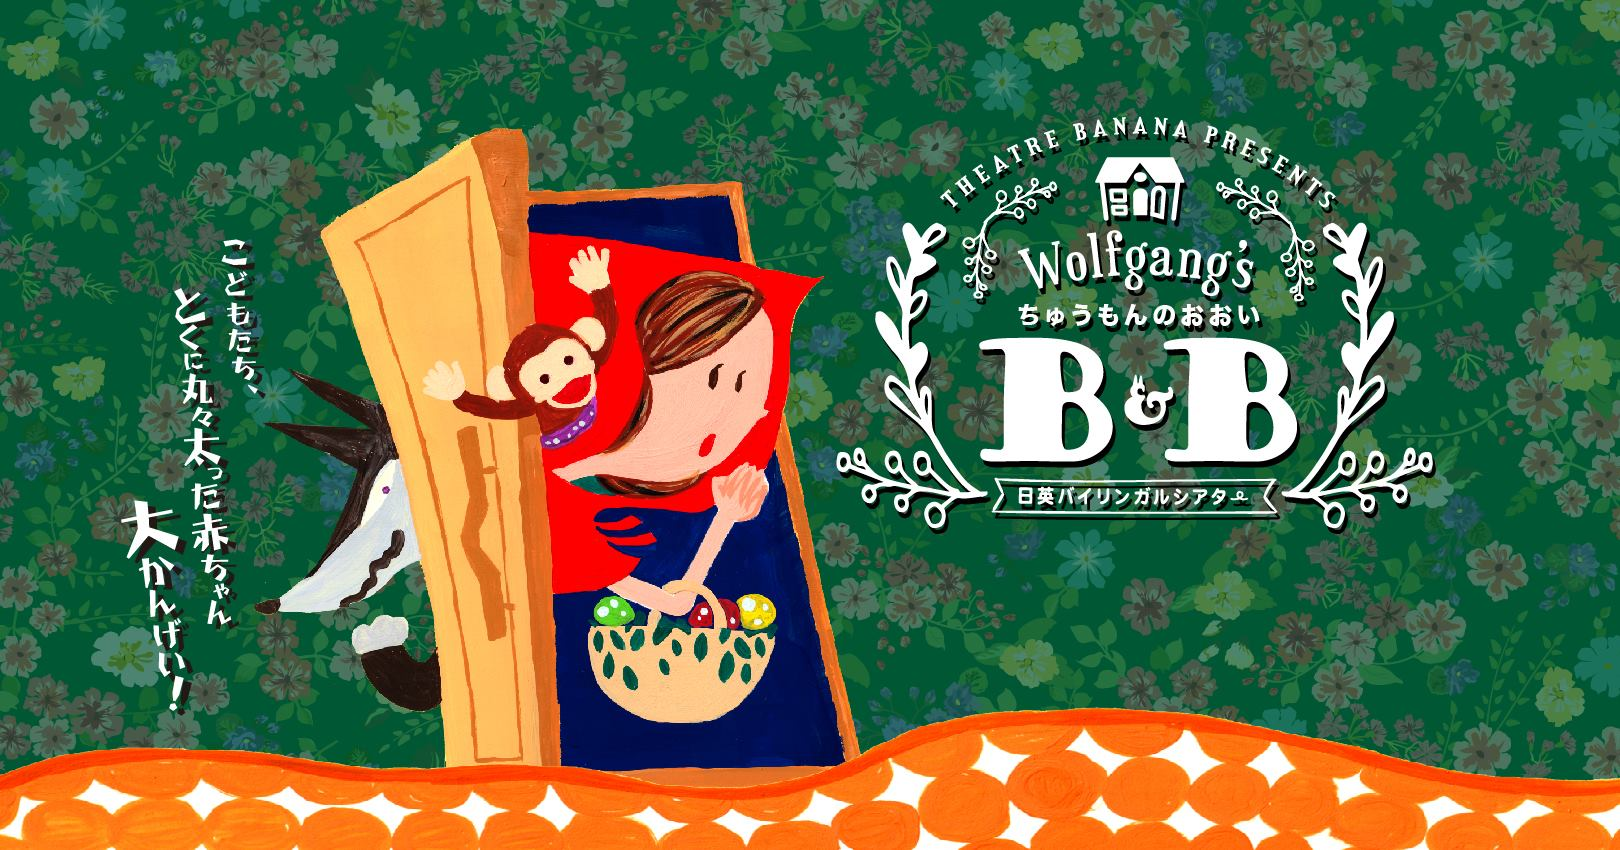 Wolfgang's B&B